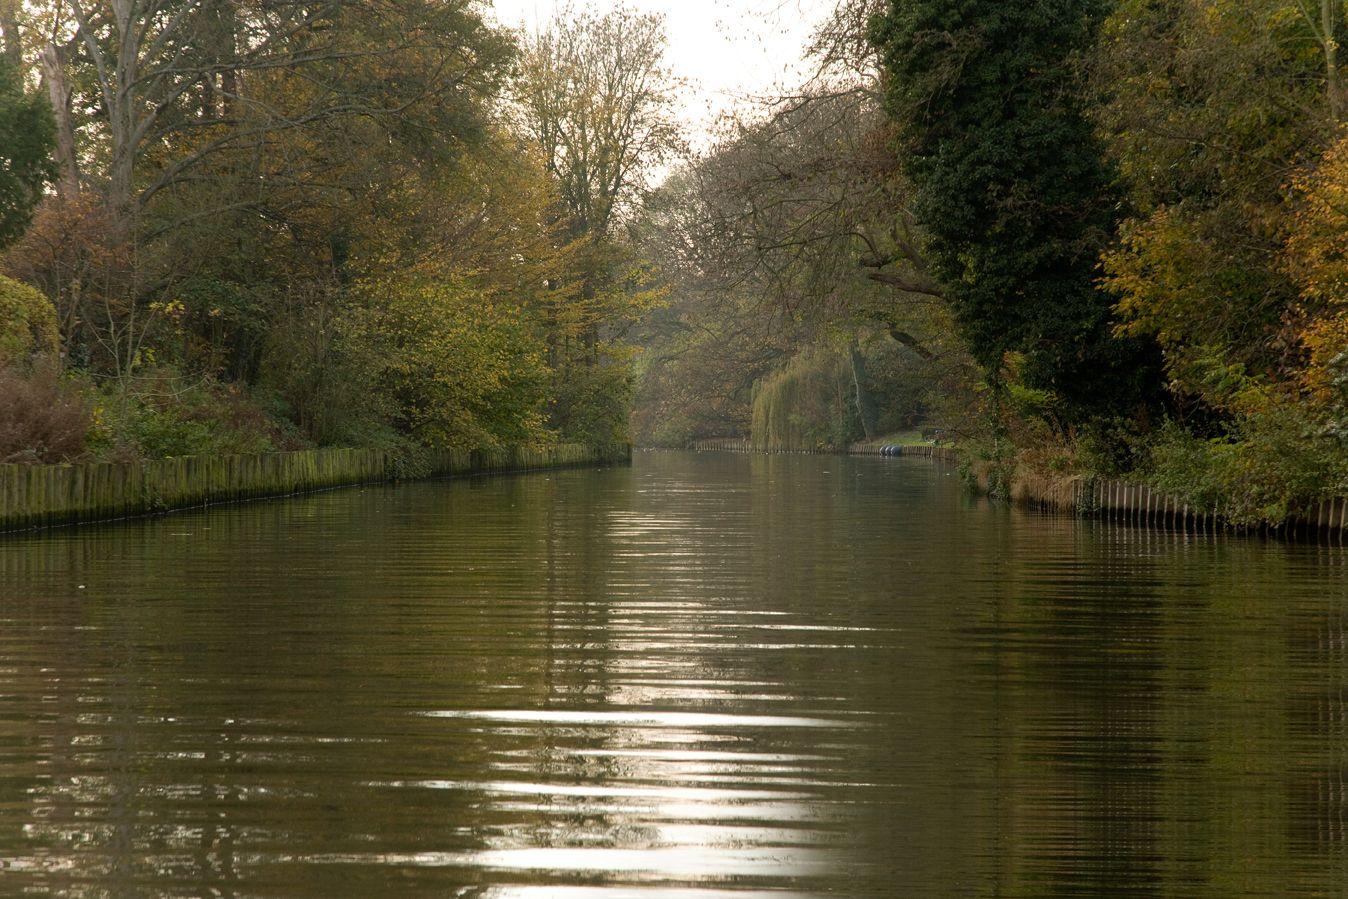 Boat4Rent Background